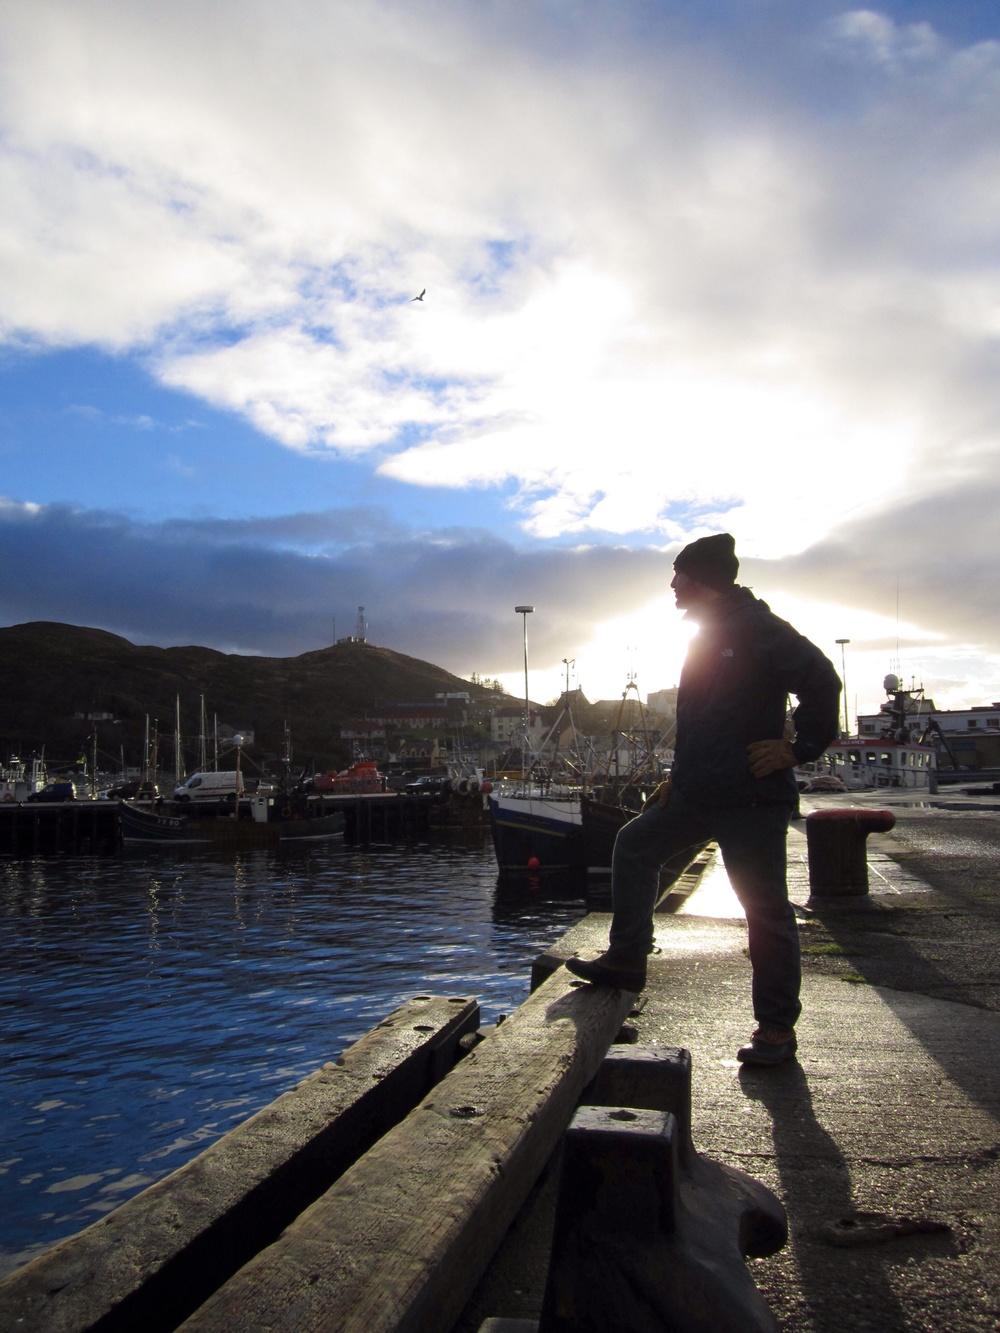 Port Mallaig, Scotland